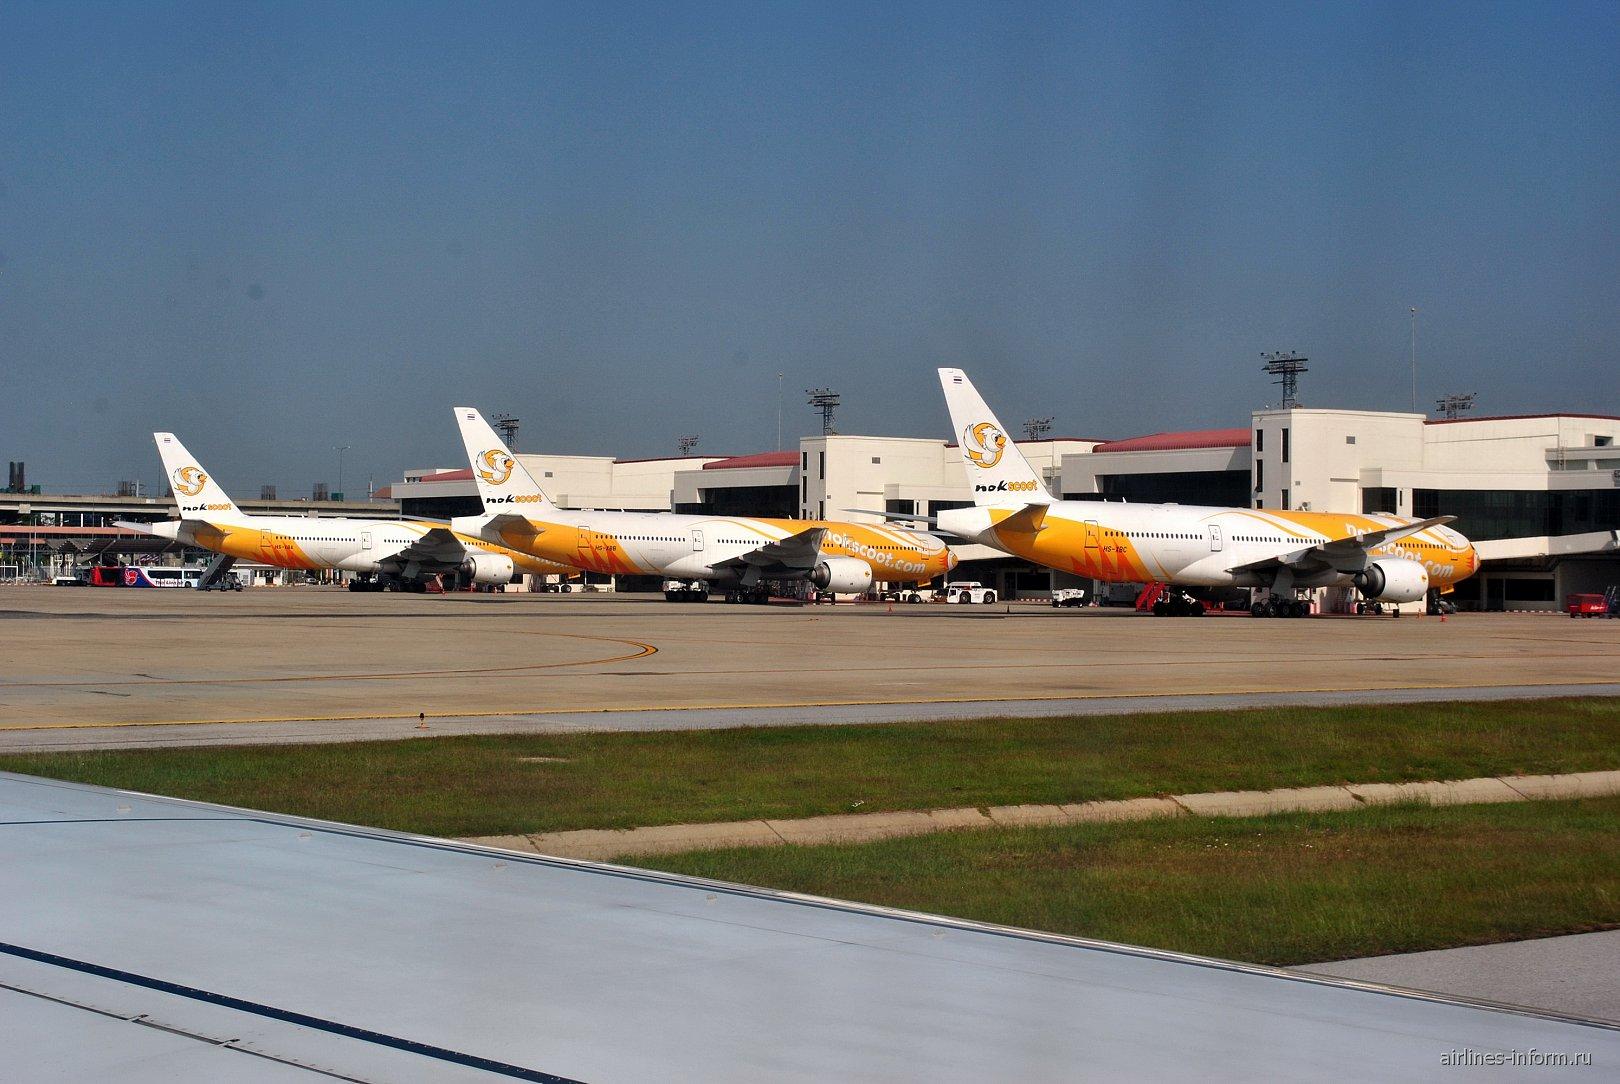 Самолеты Боинг-777-200 авиакомпании NokScoot в аэропорту Бангкок Дон Муанг